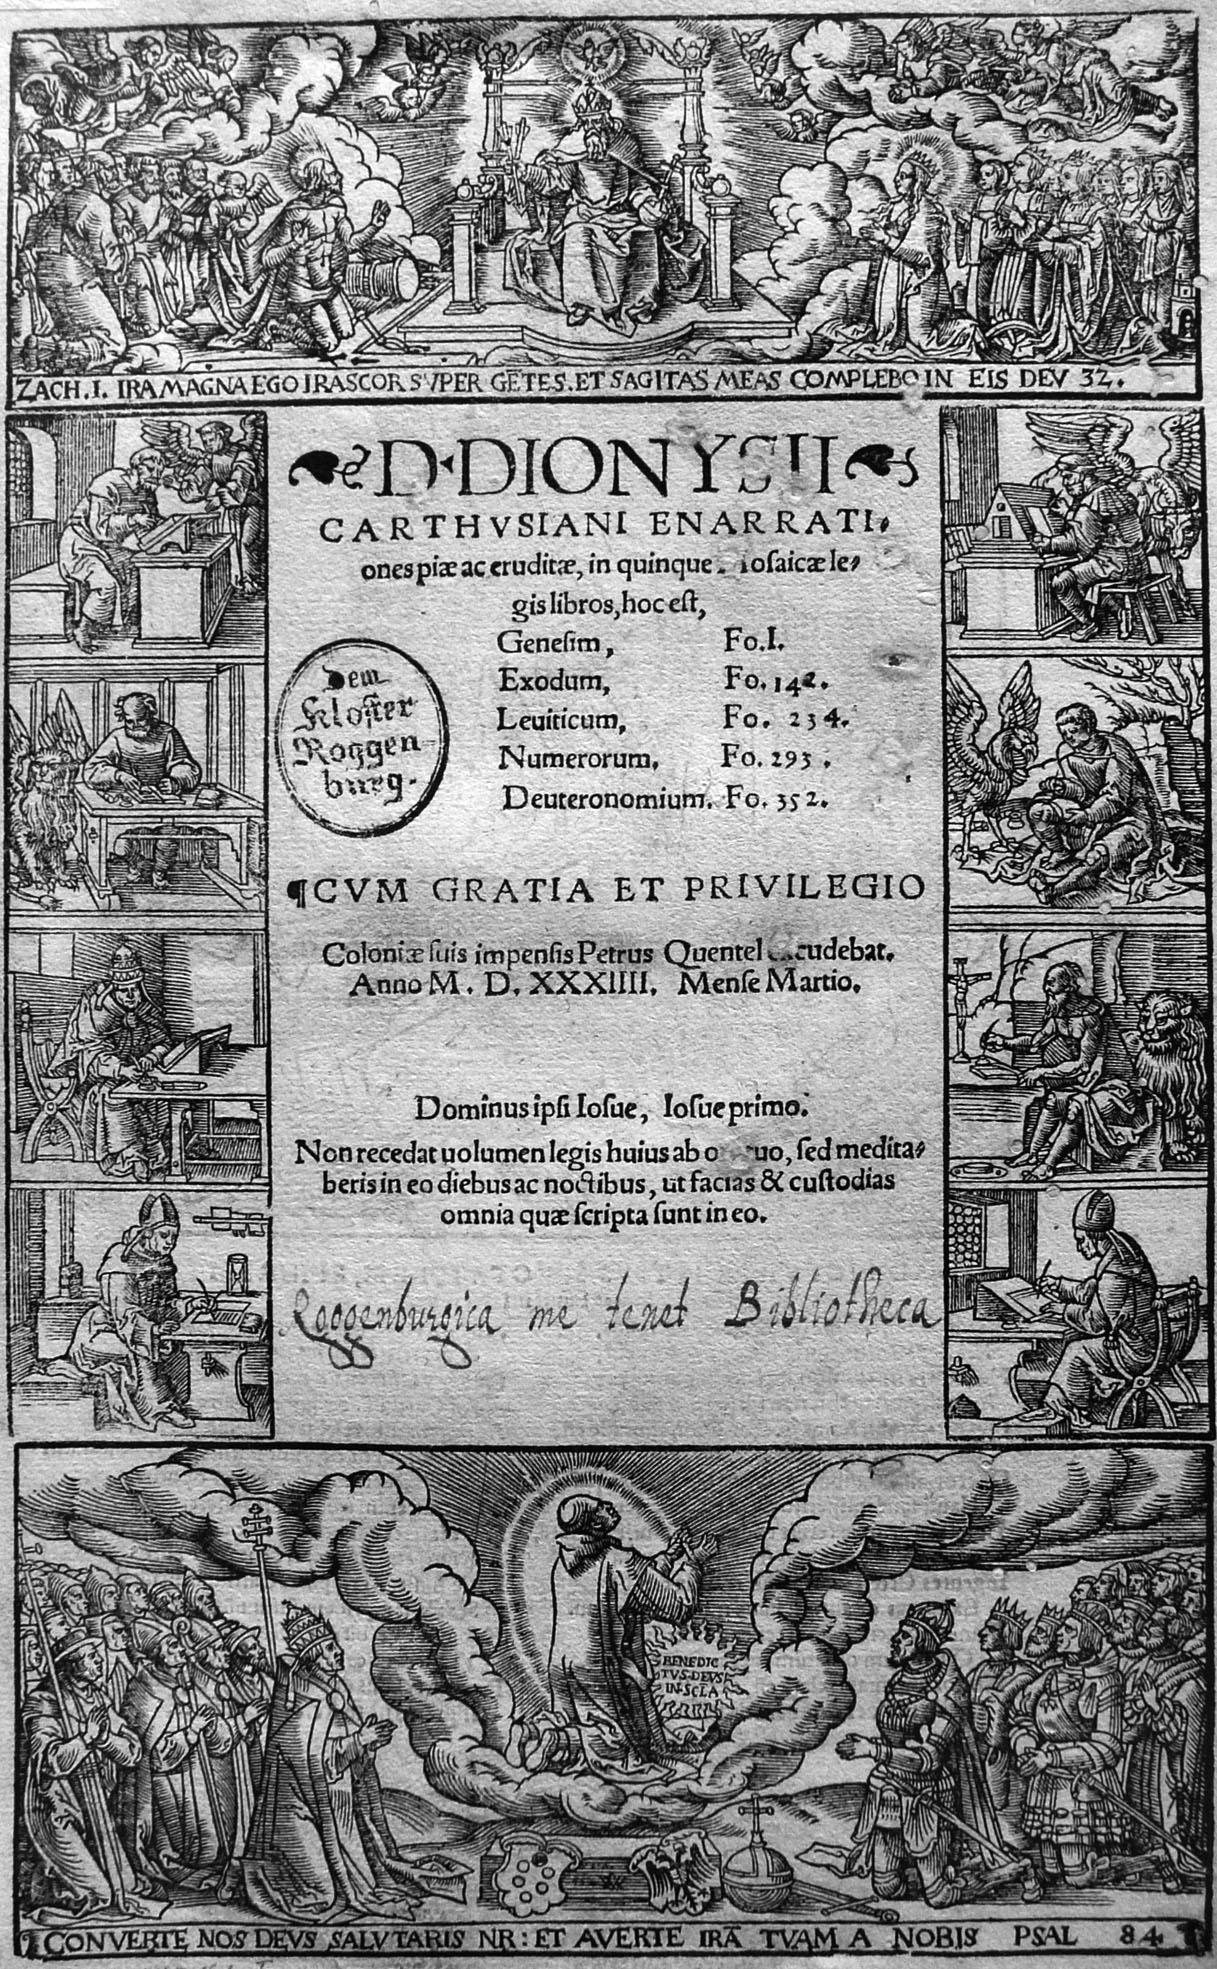 Woensam A; Dionysius Carthusiensis